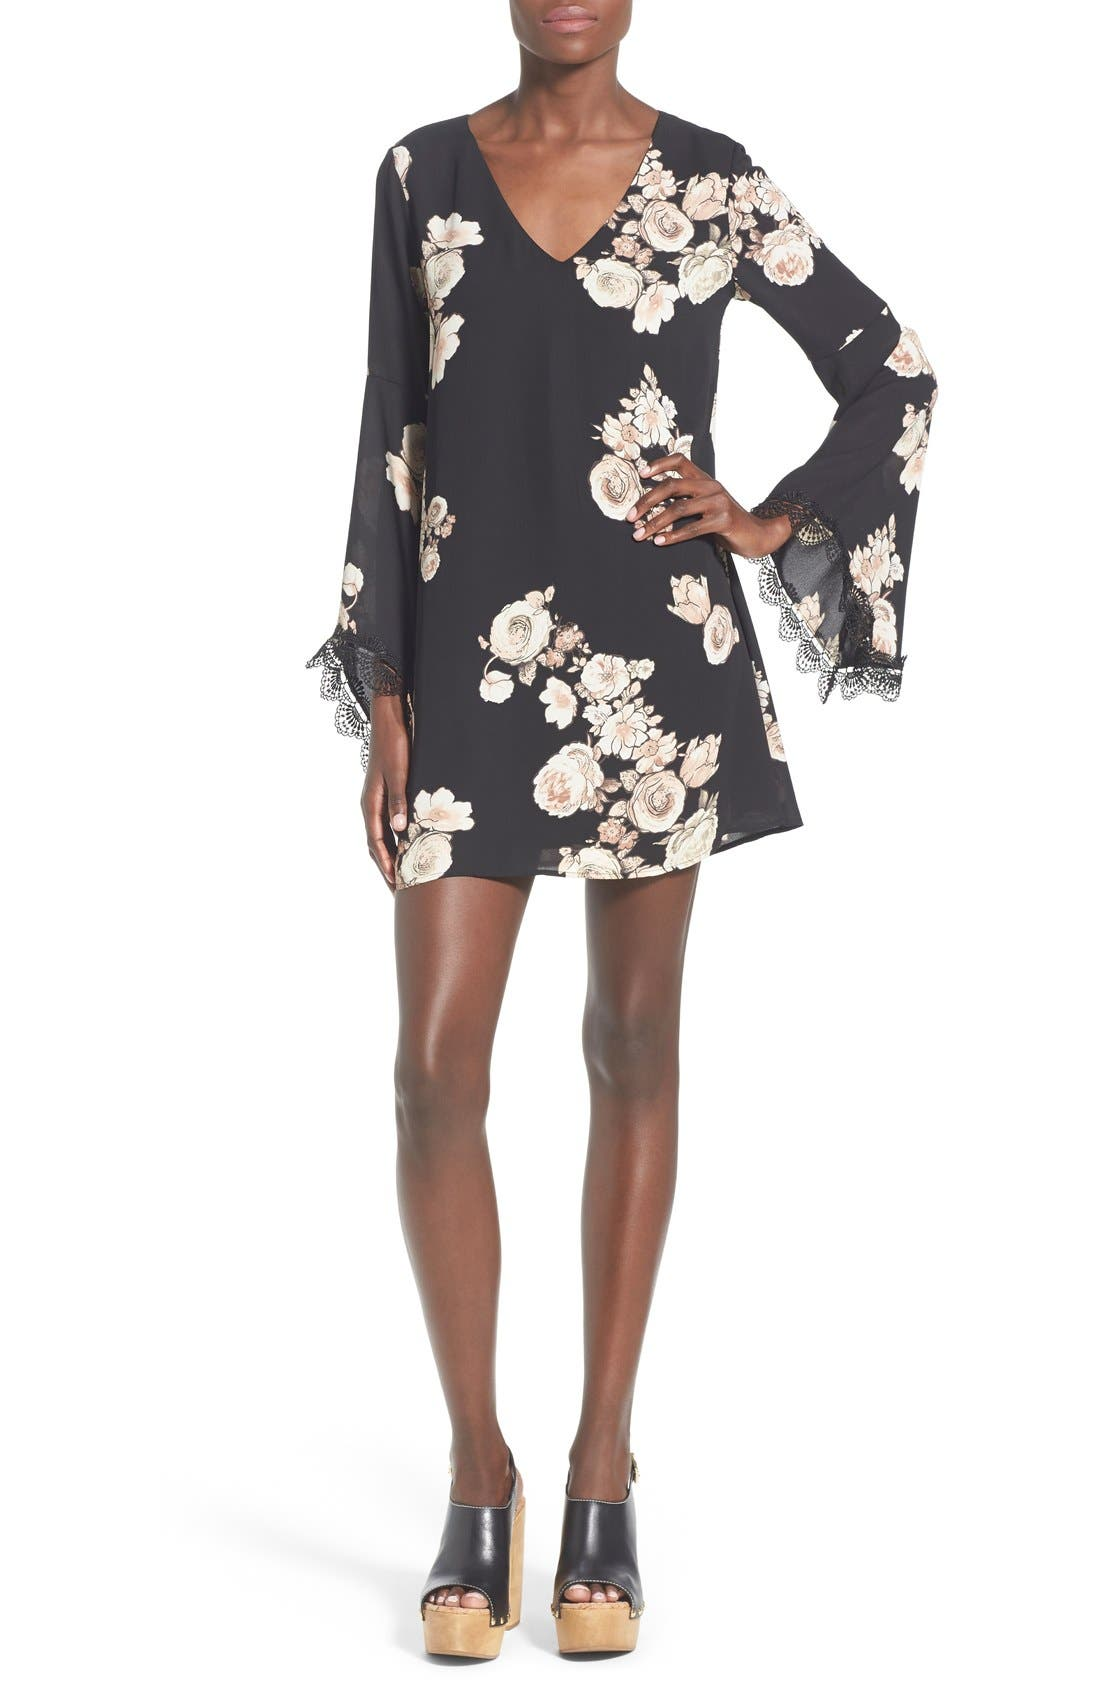 ASTR Lace Trim Shift Dress,                         Main,                         color, Black/ Blush Multi